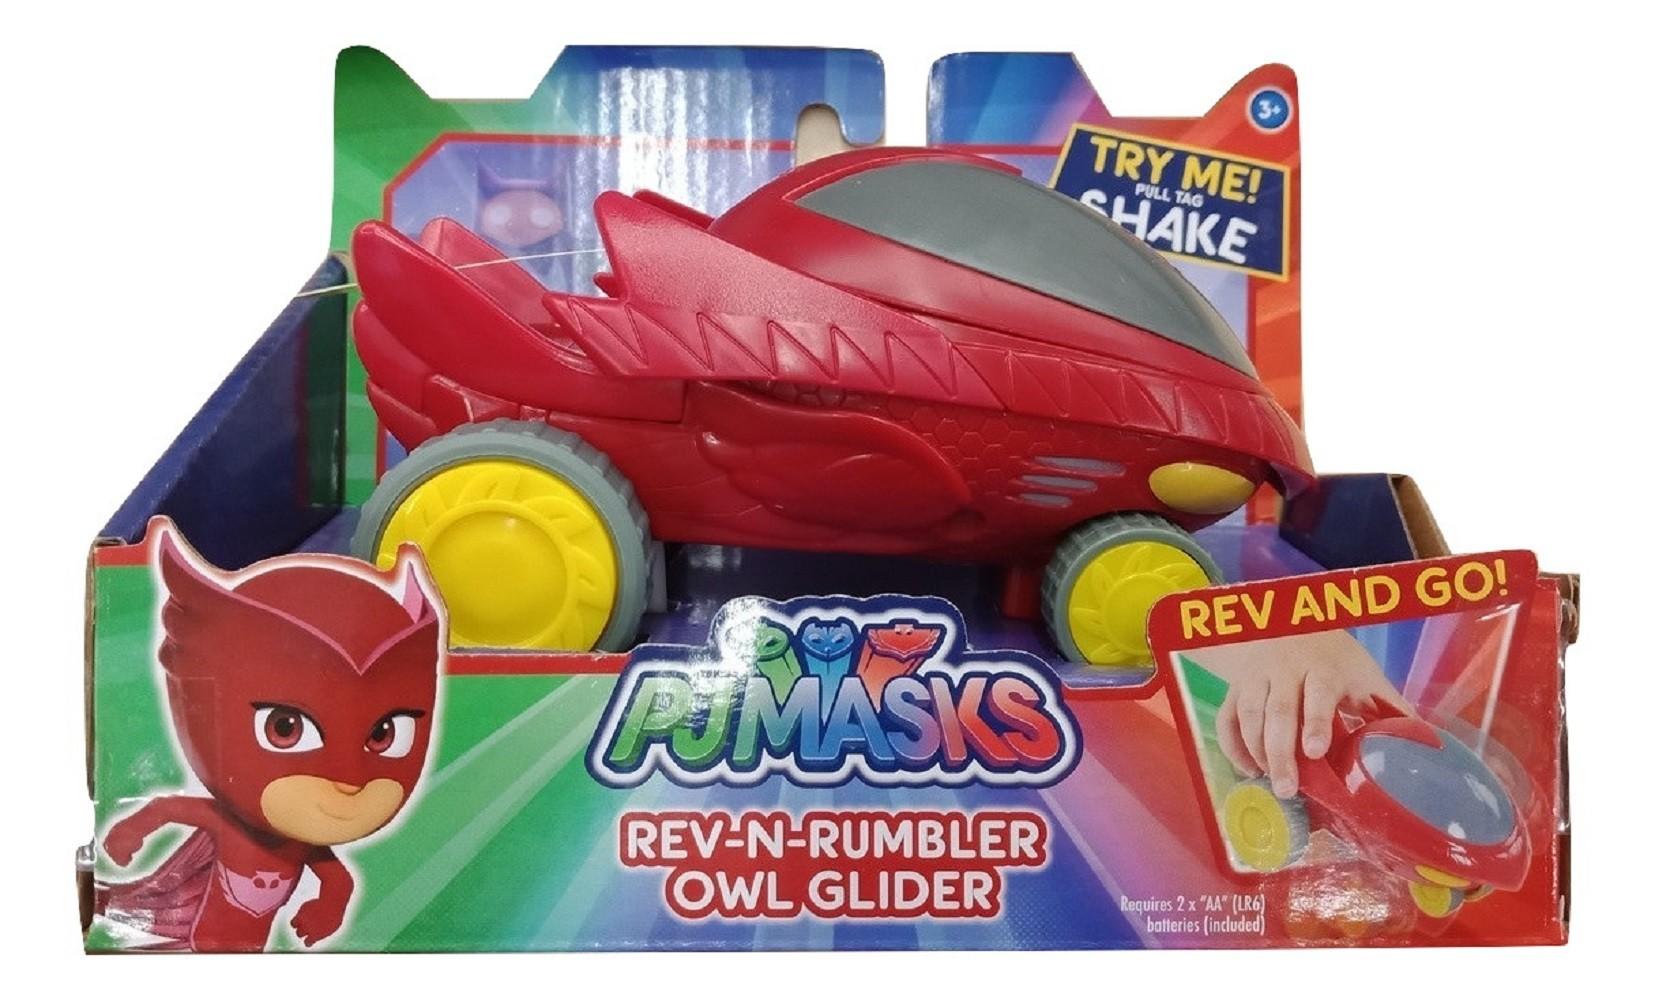 Atch Pony Transformer Pj Mask Michaelieclark Topeng Masks Minions Paw Patrol Star Vtech